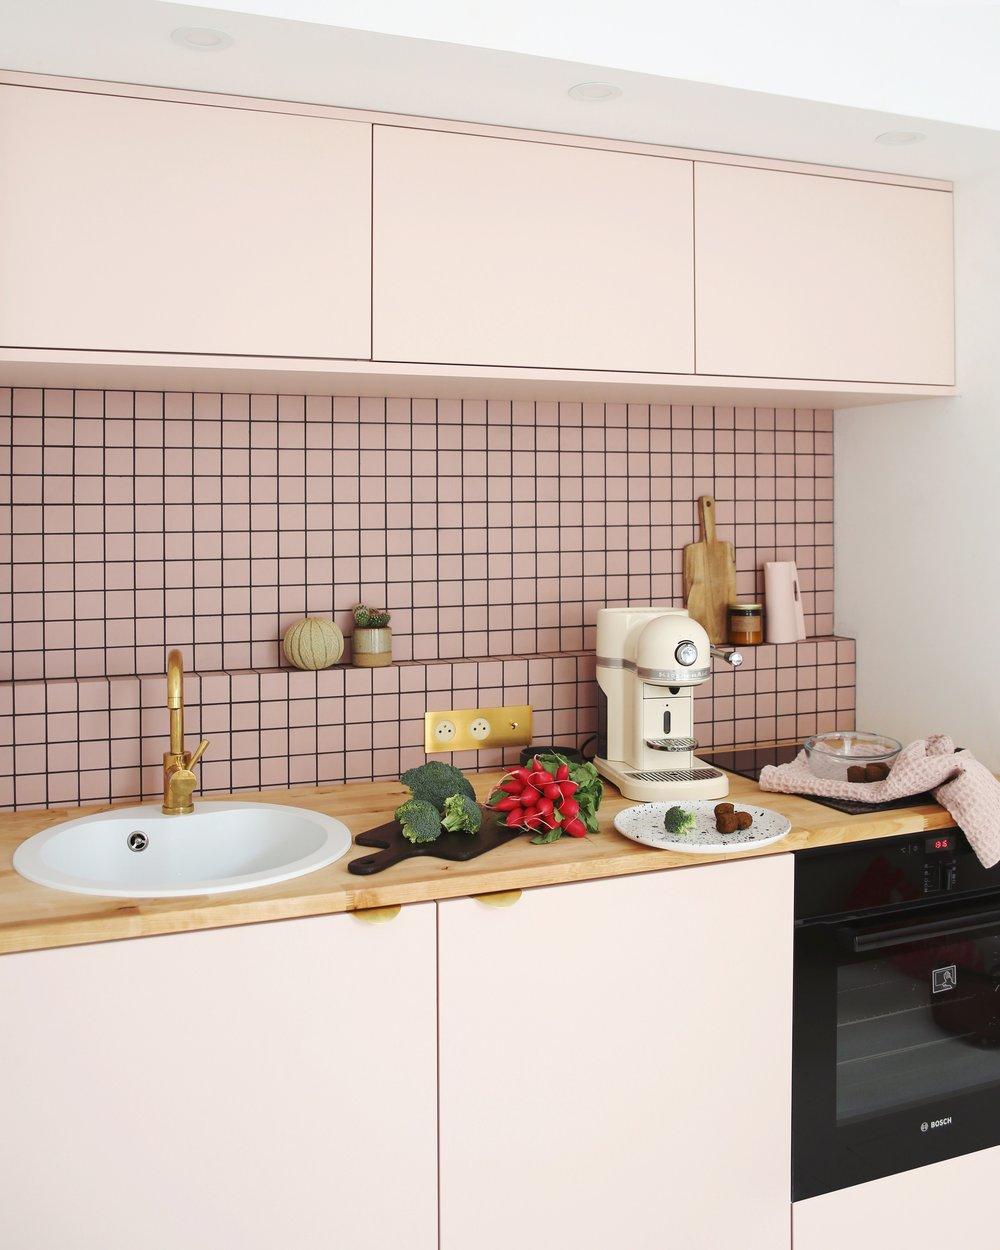 cuisine-dorc3a9e-robinet-kc-7.jpg